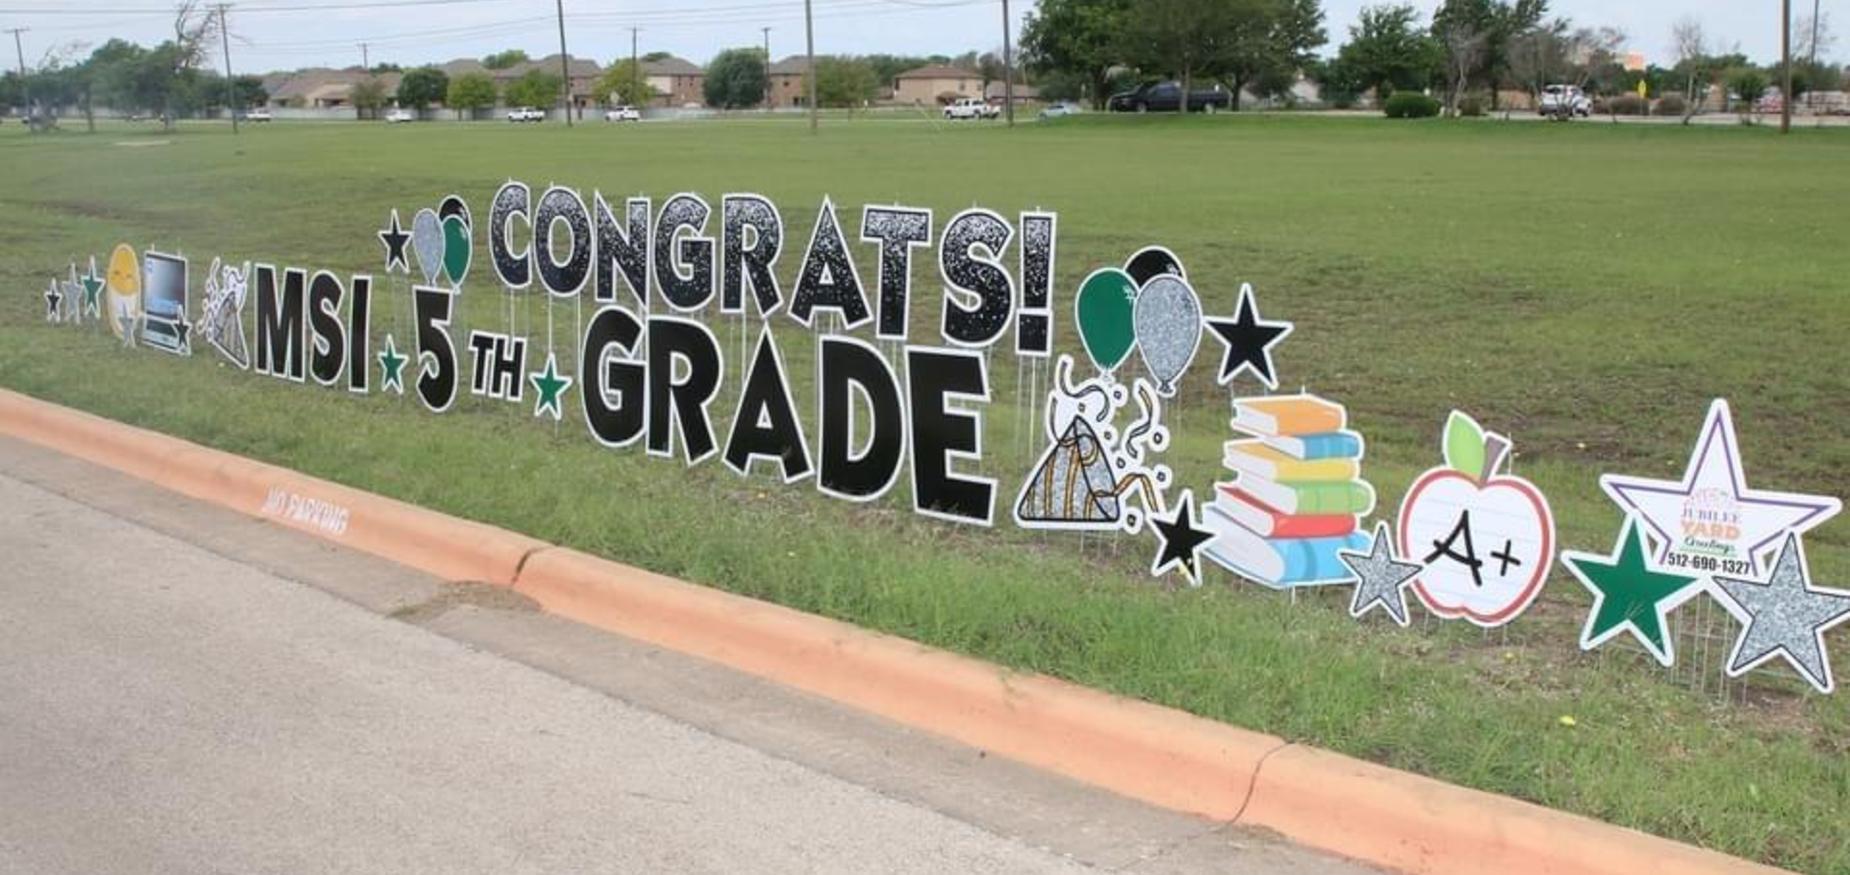 Congrats MSI 5th Grade